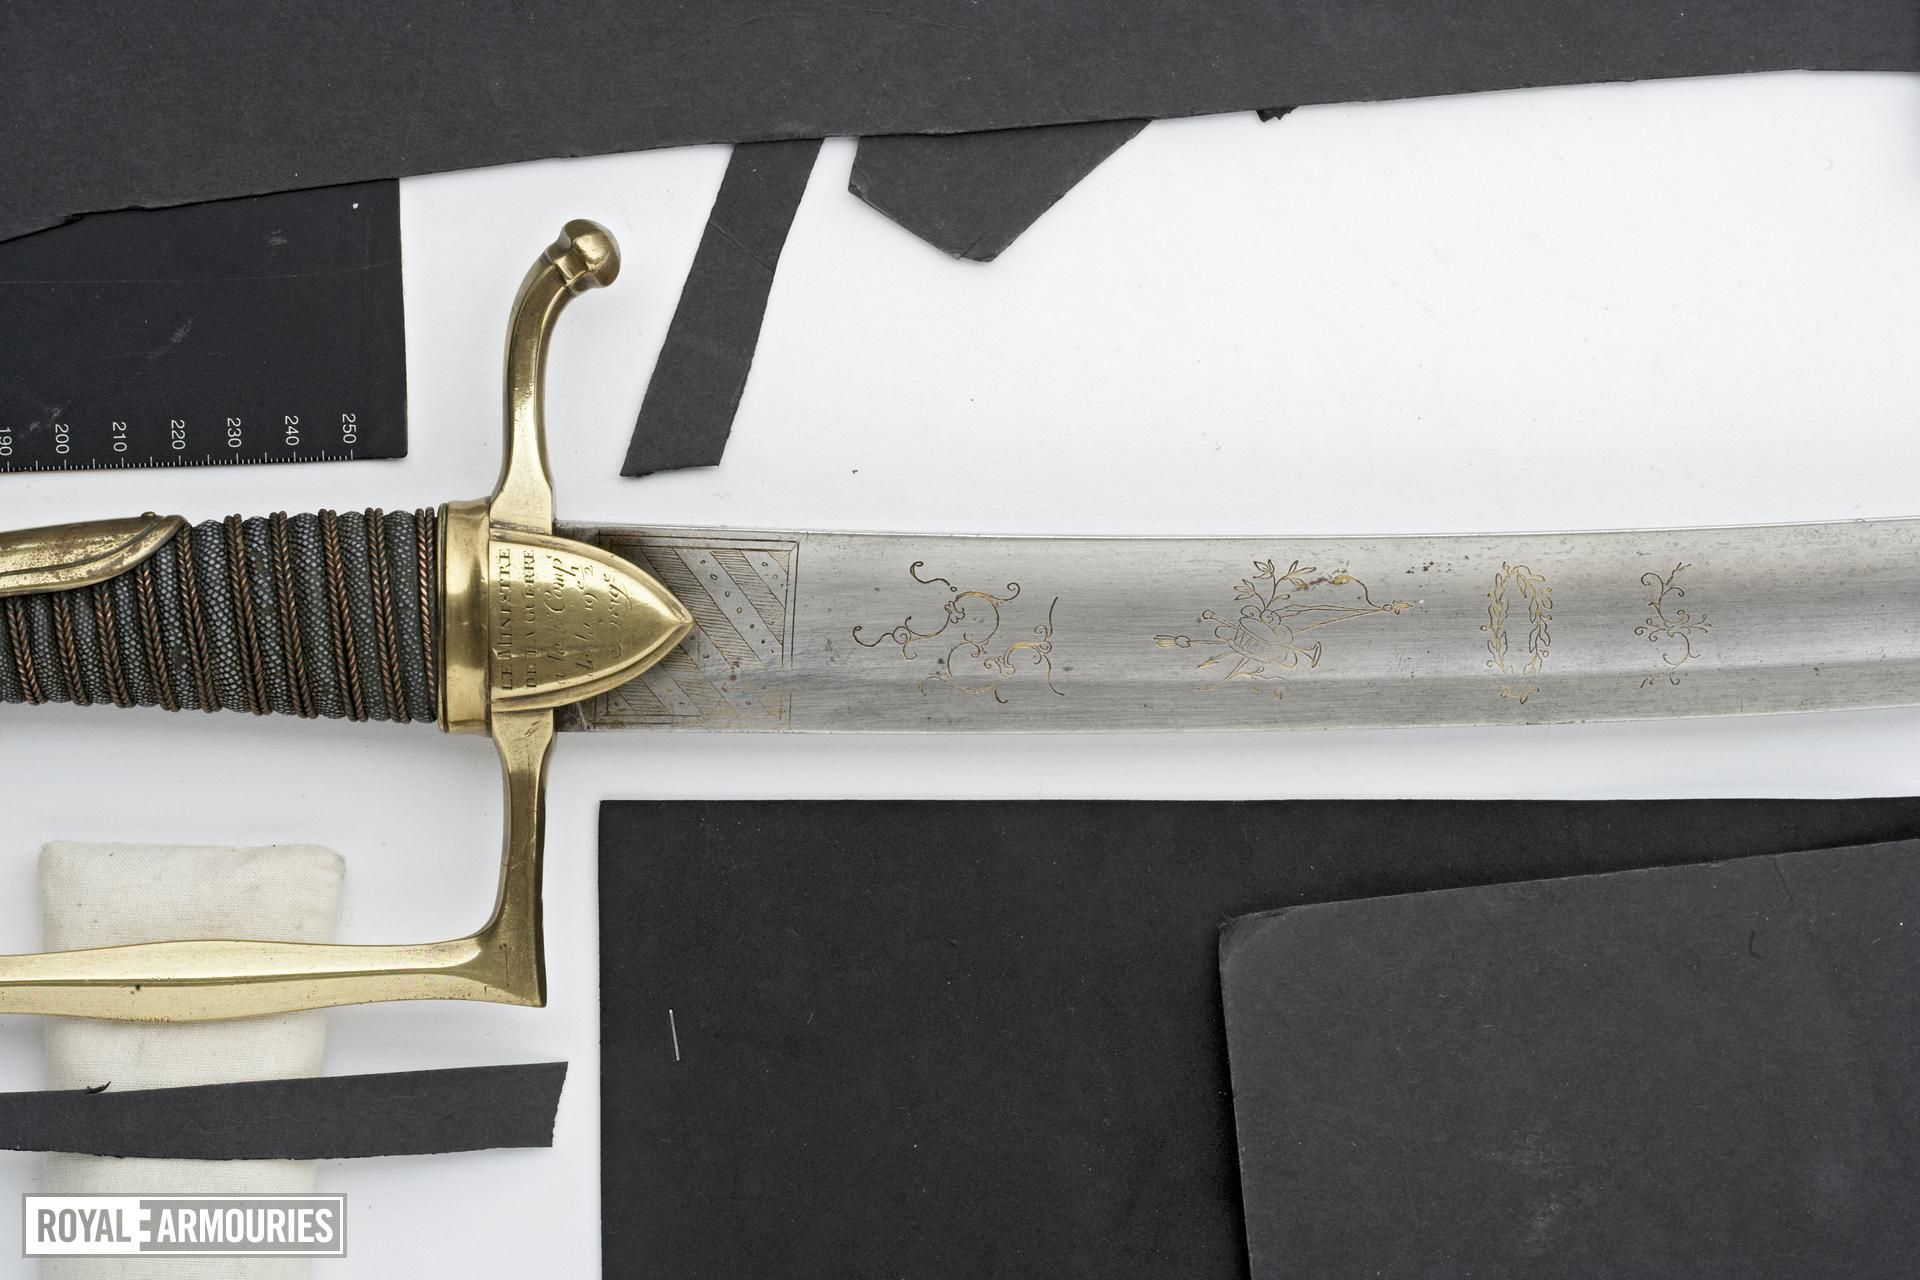 Hanger Sword of honour, Presentation hanger (Briquet de recompense).